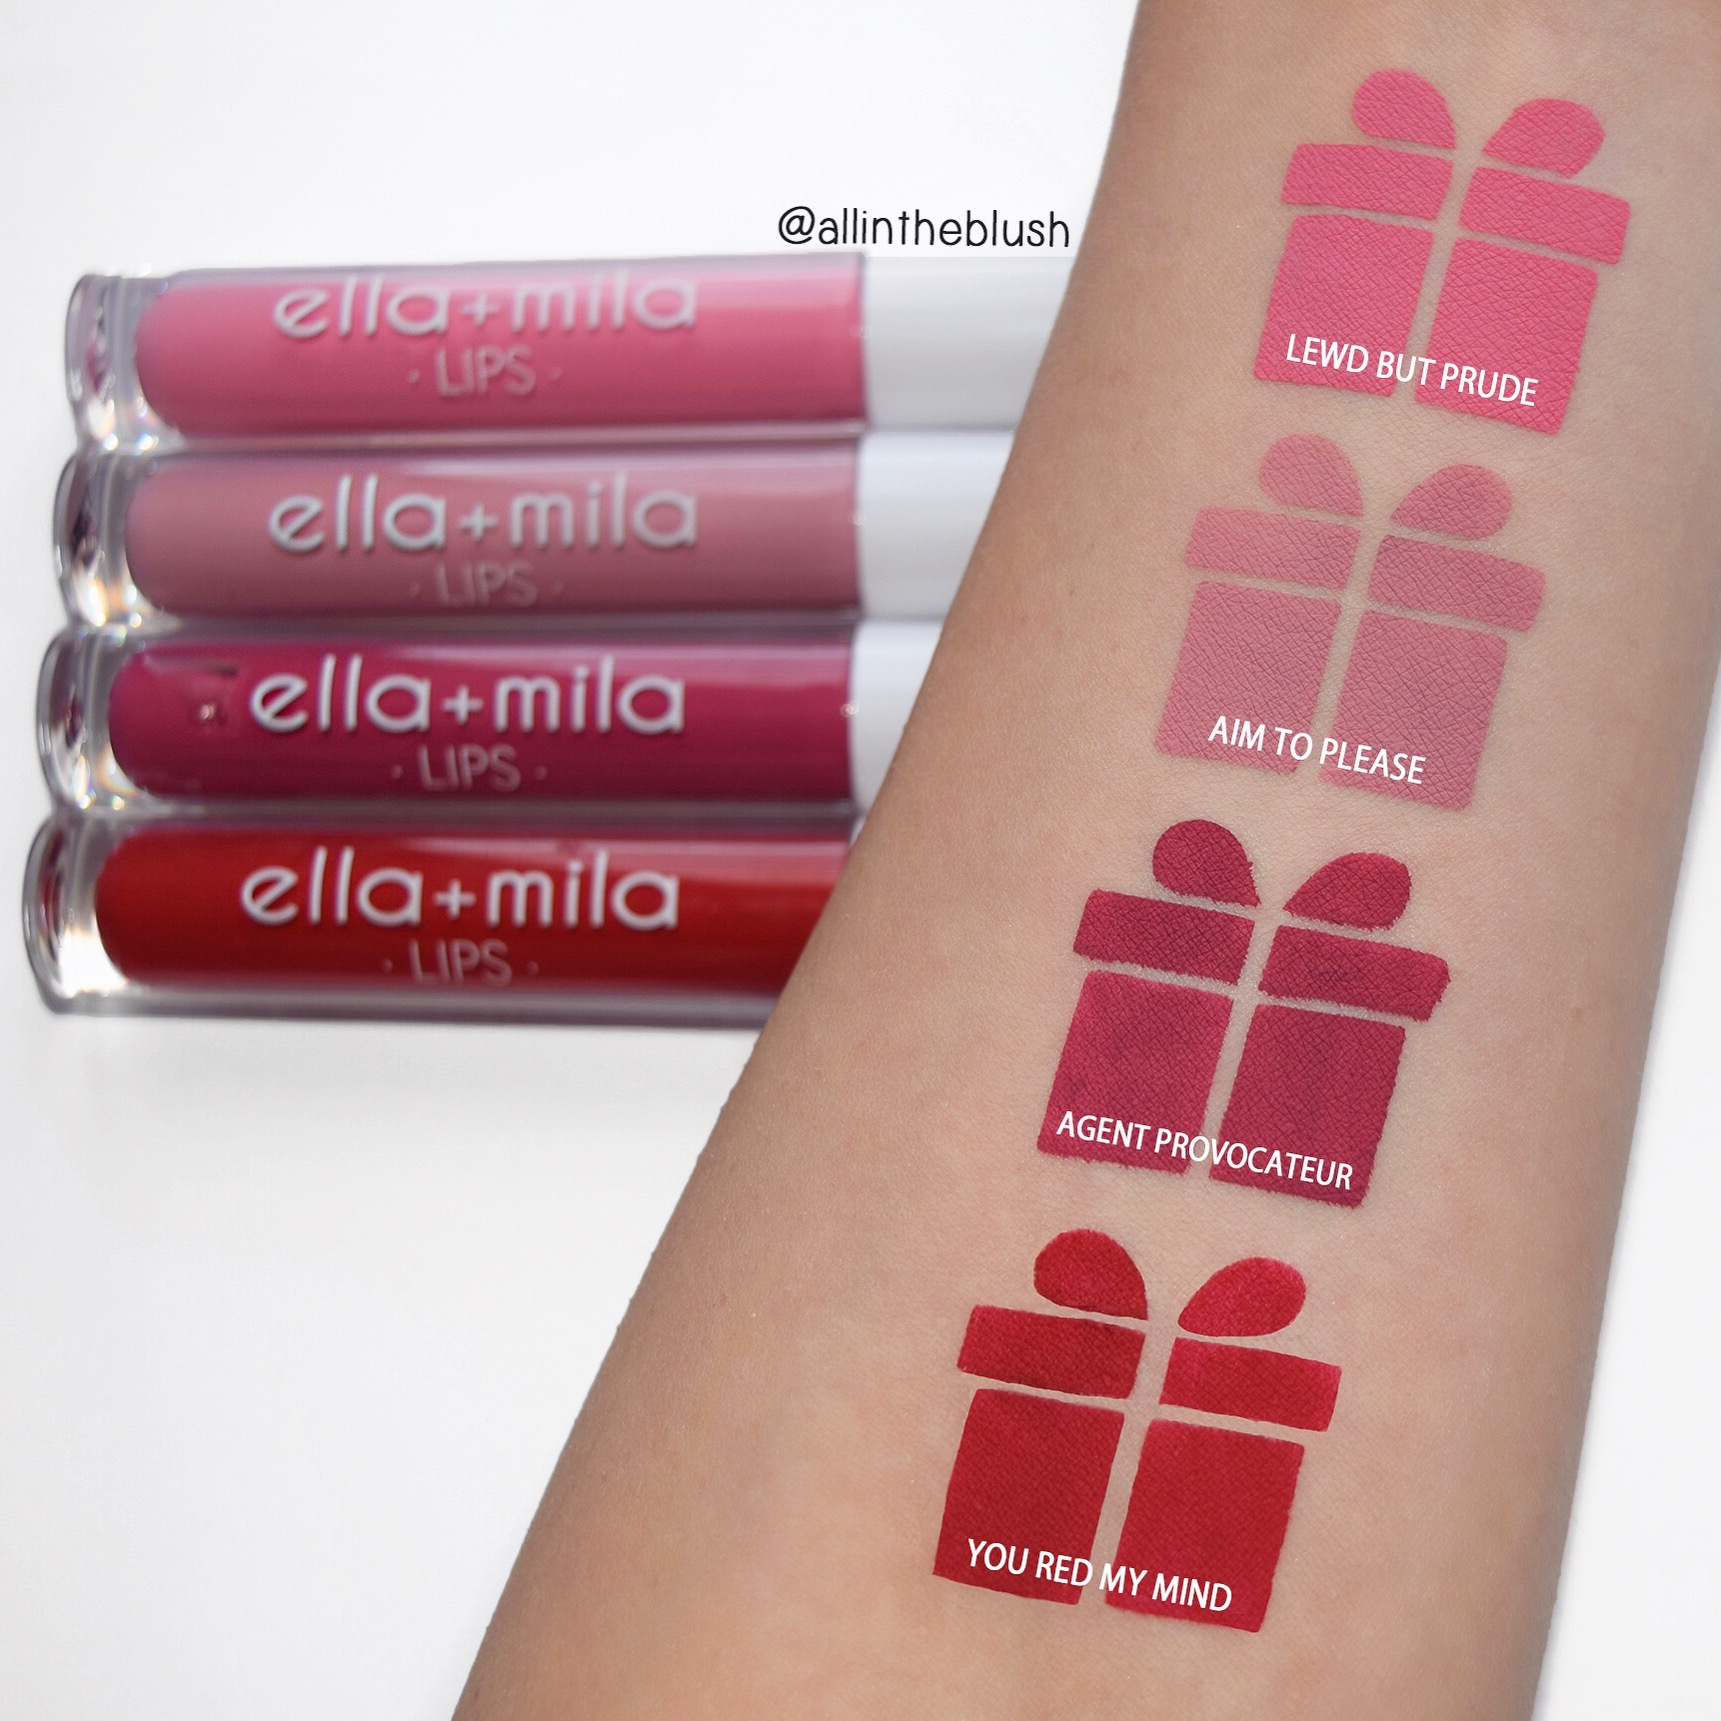 Ella + Mila Velvet Matte Liquid Lipstick Swatches